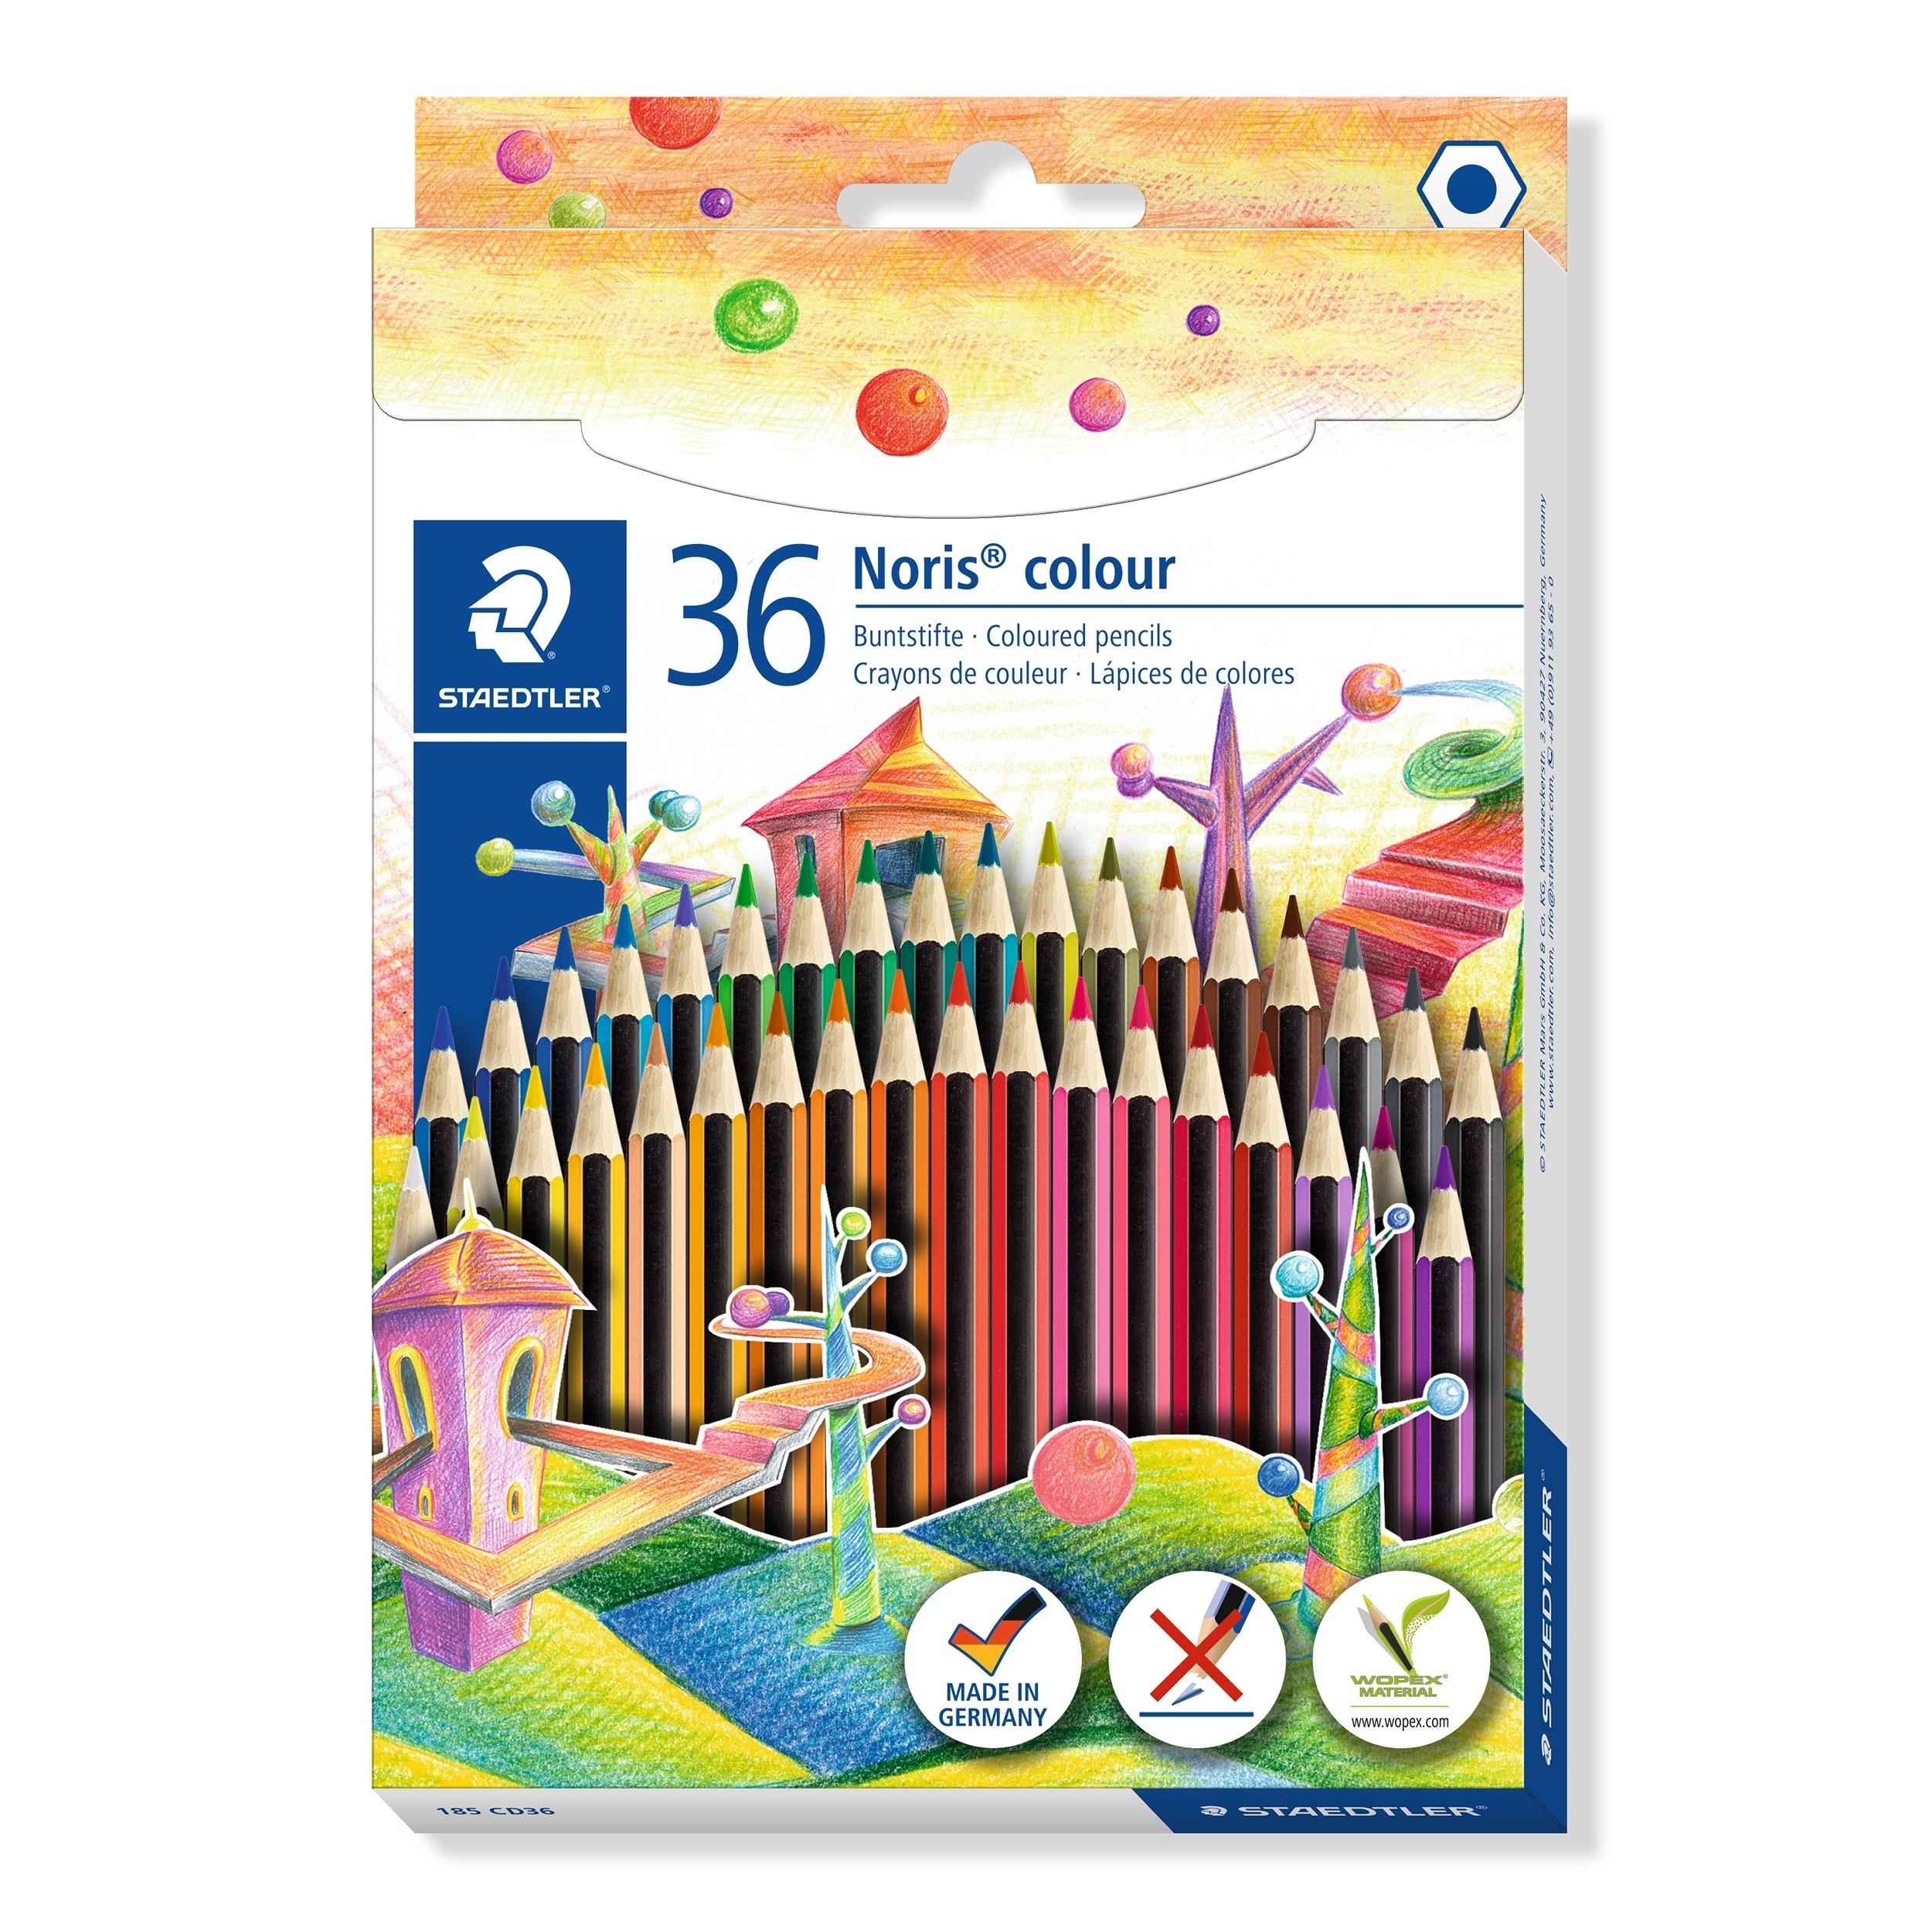 STAEDTLER Farbstift Noris Color 36er Kartonetui - Mehrfarben - 36 Stück(e)